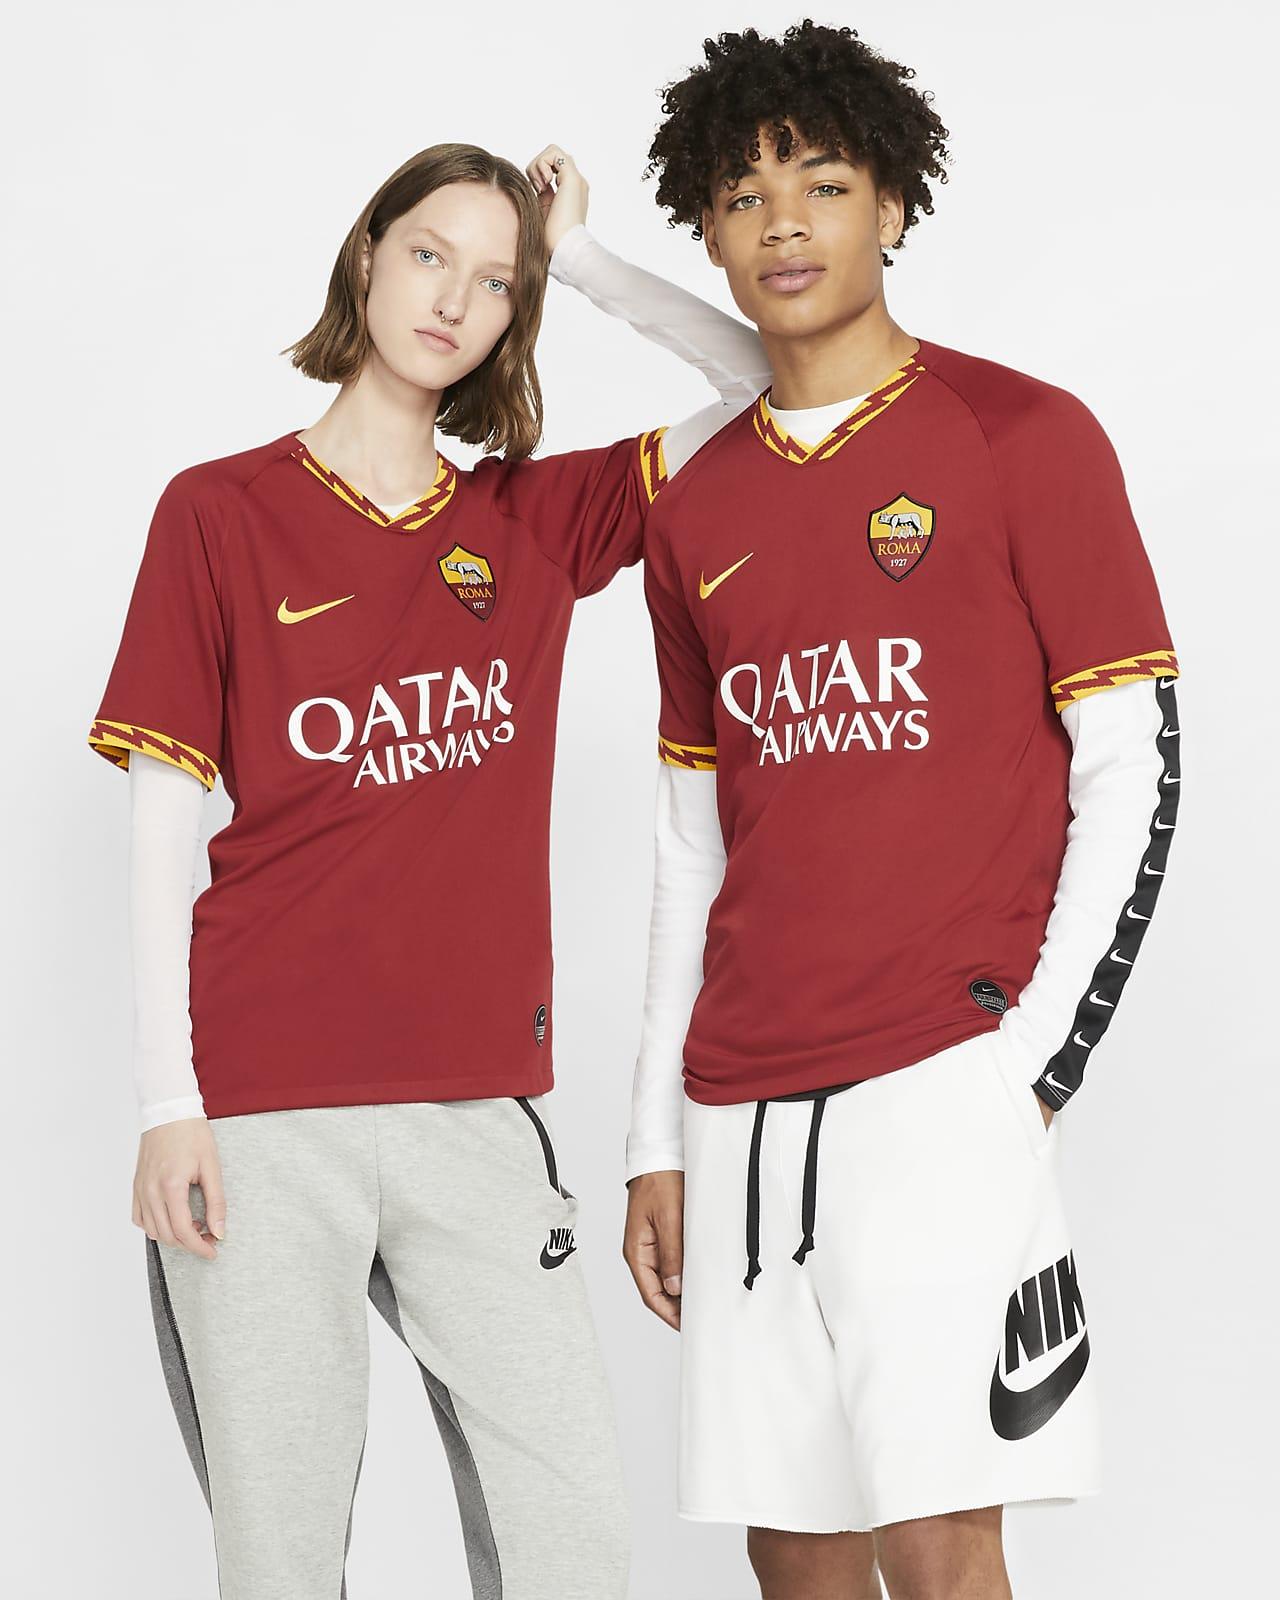 A.S. Roma 2019/20 Stadium Home Men's Football Shirt